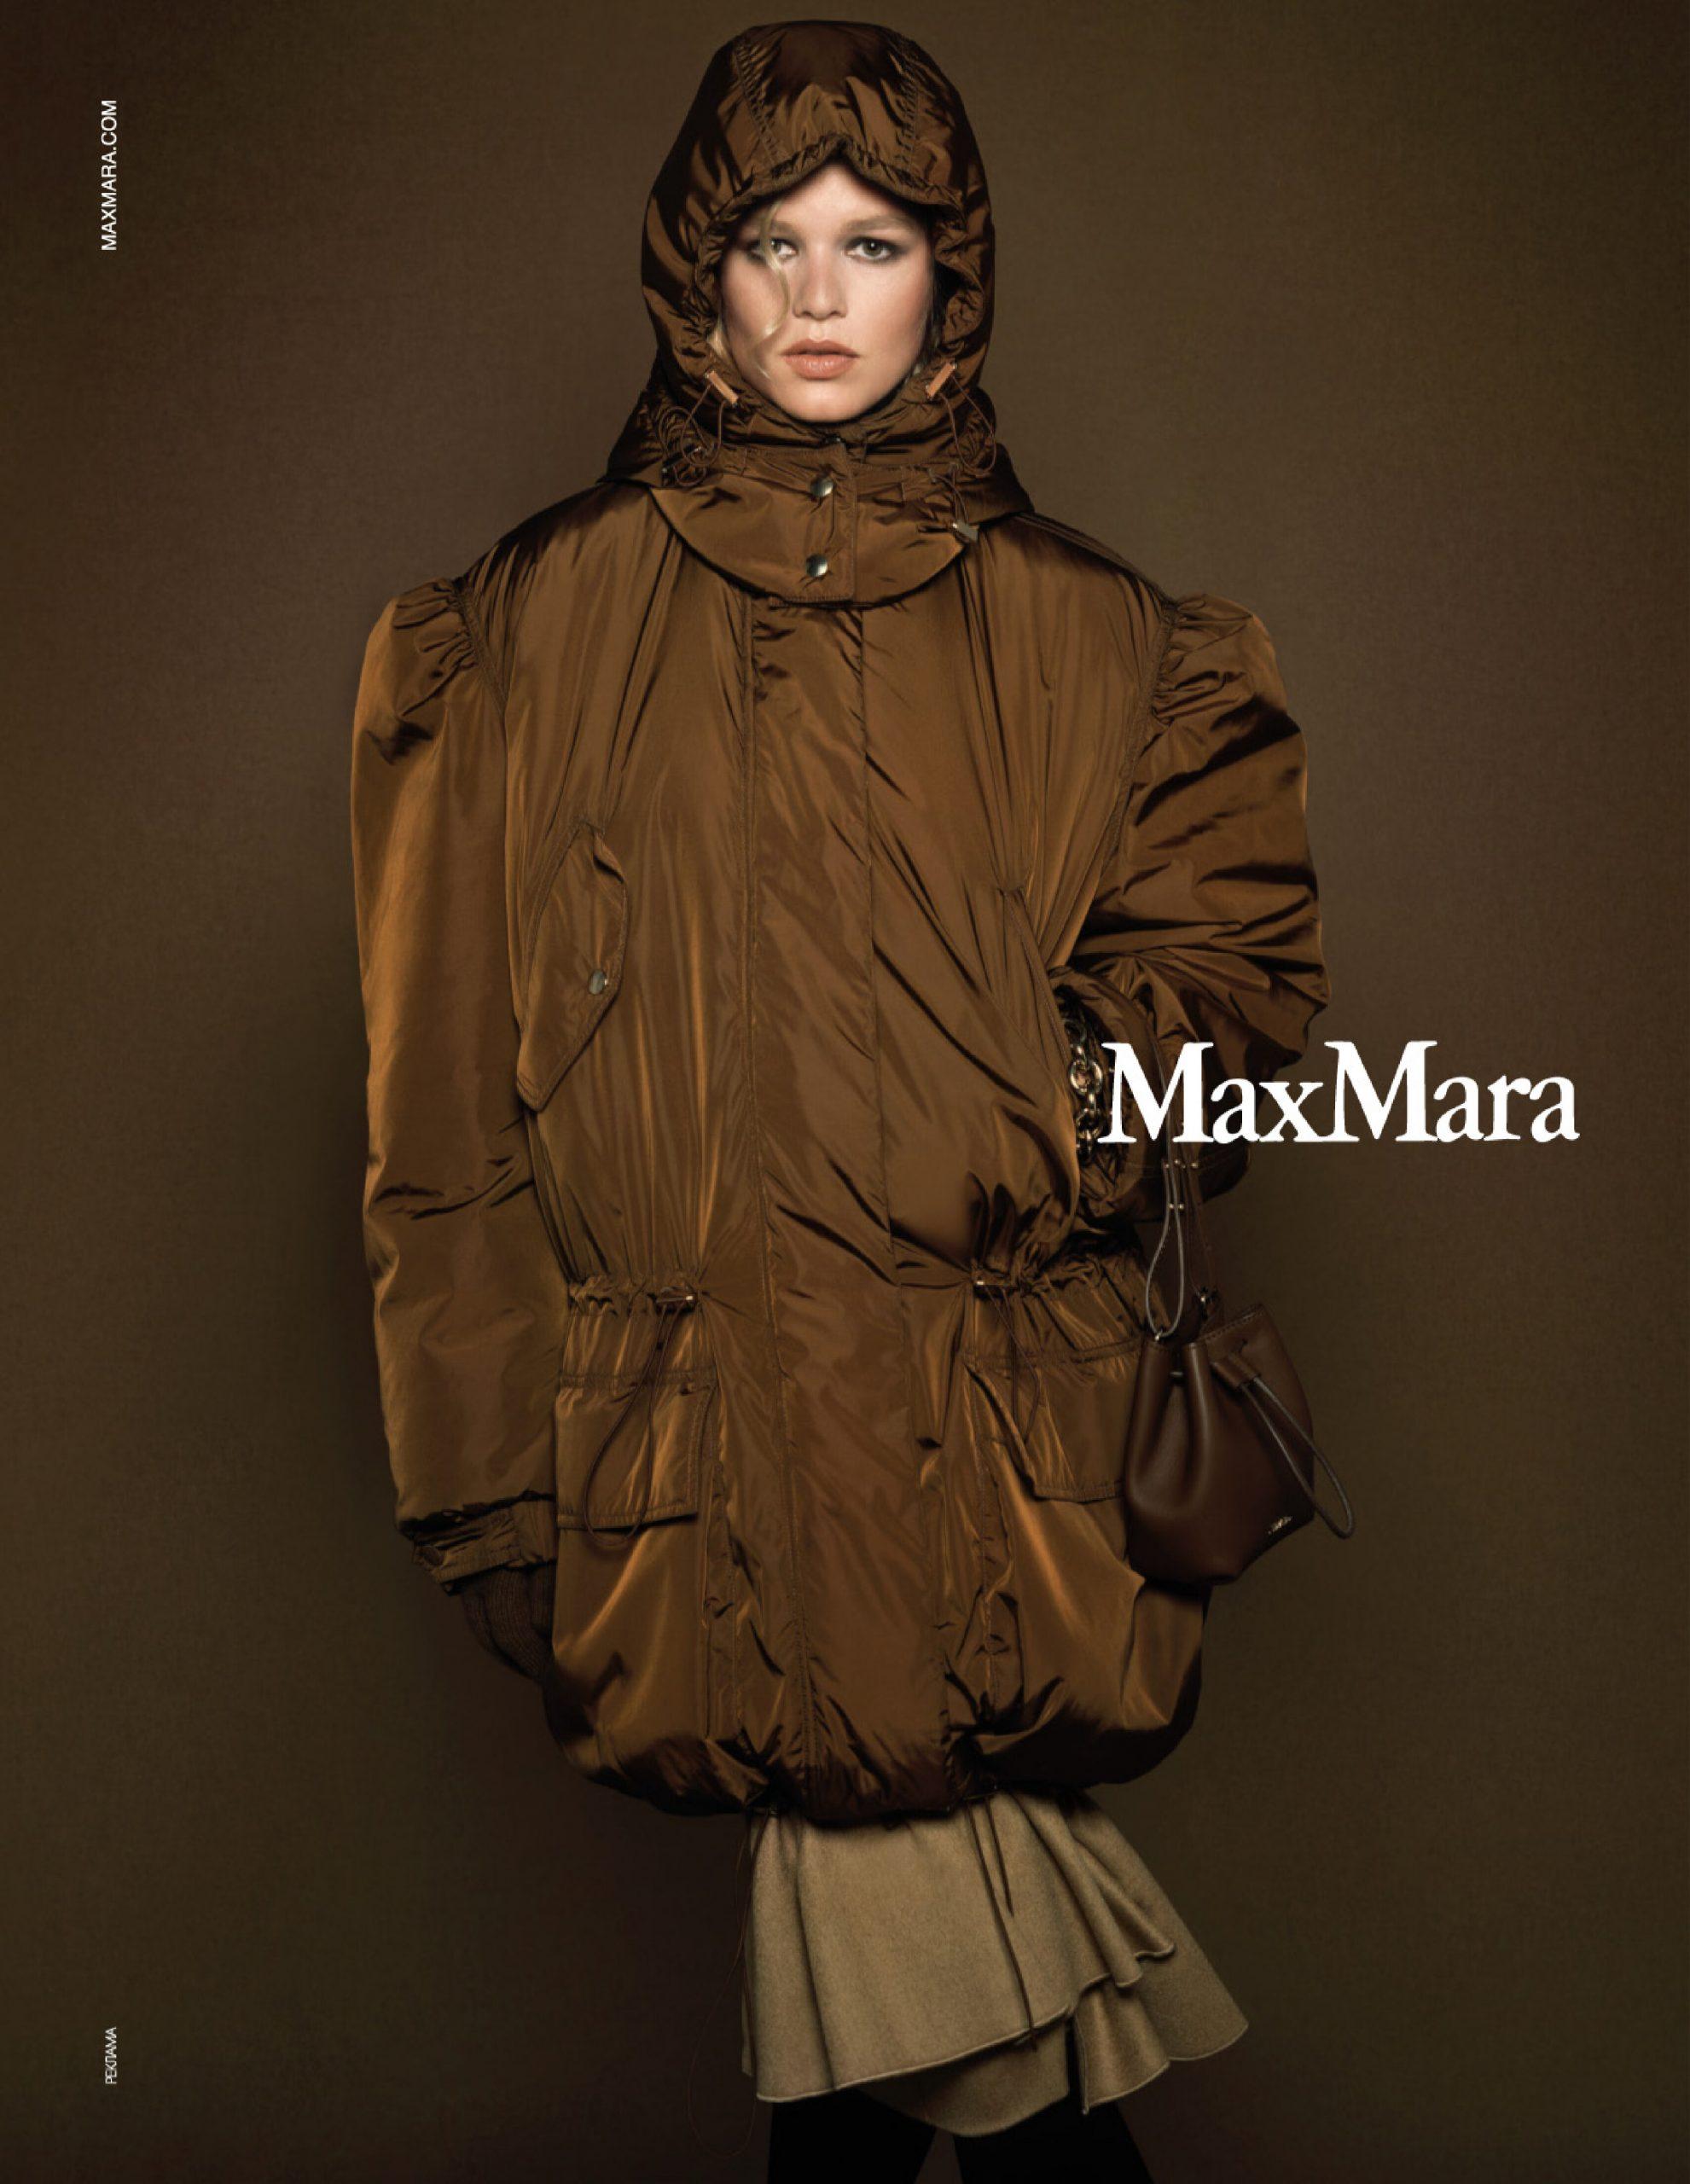 Max Mara Fall 2020 Ad Campaign Photos